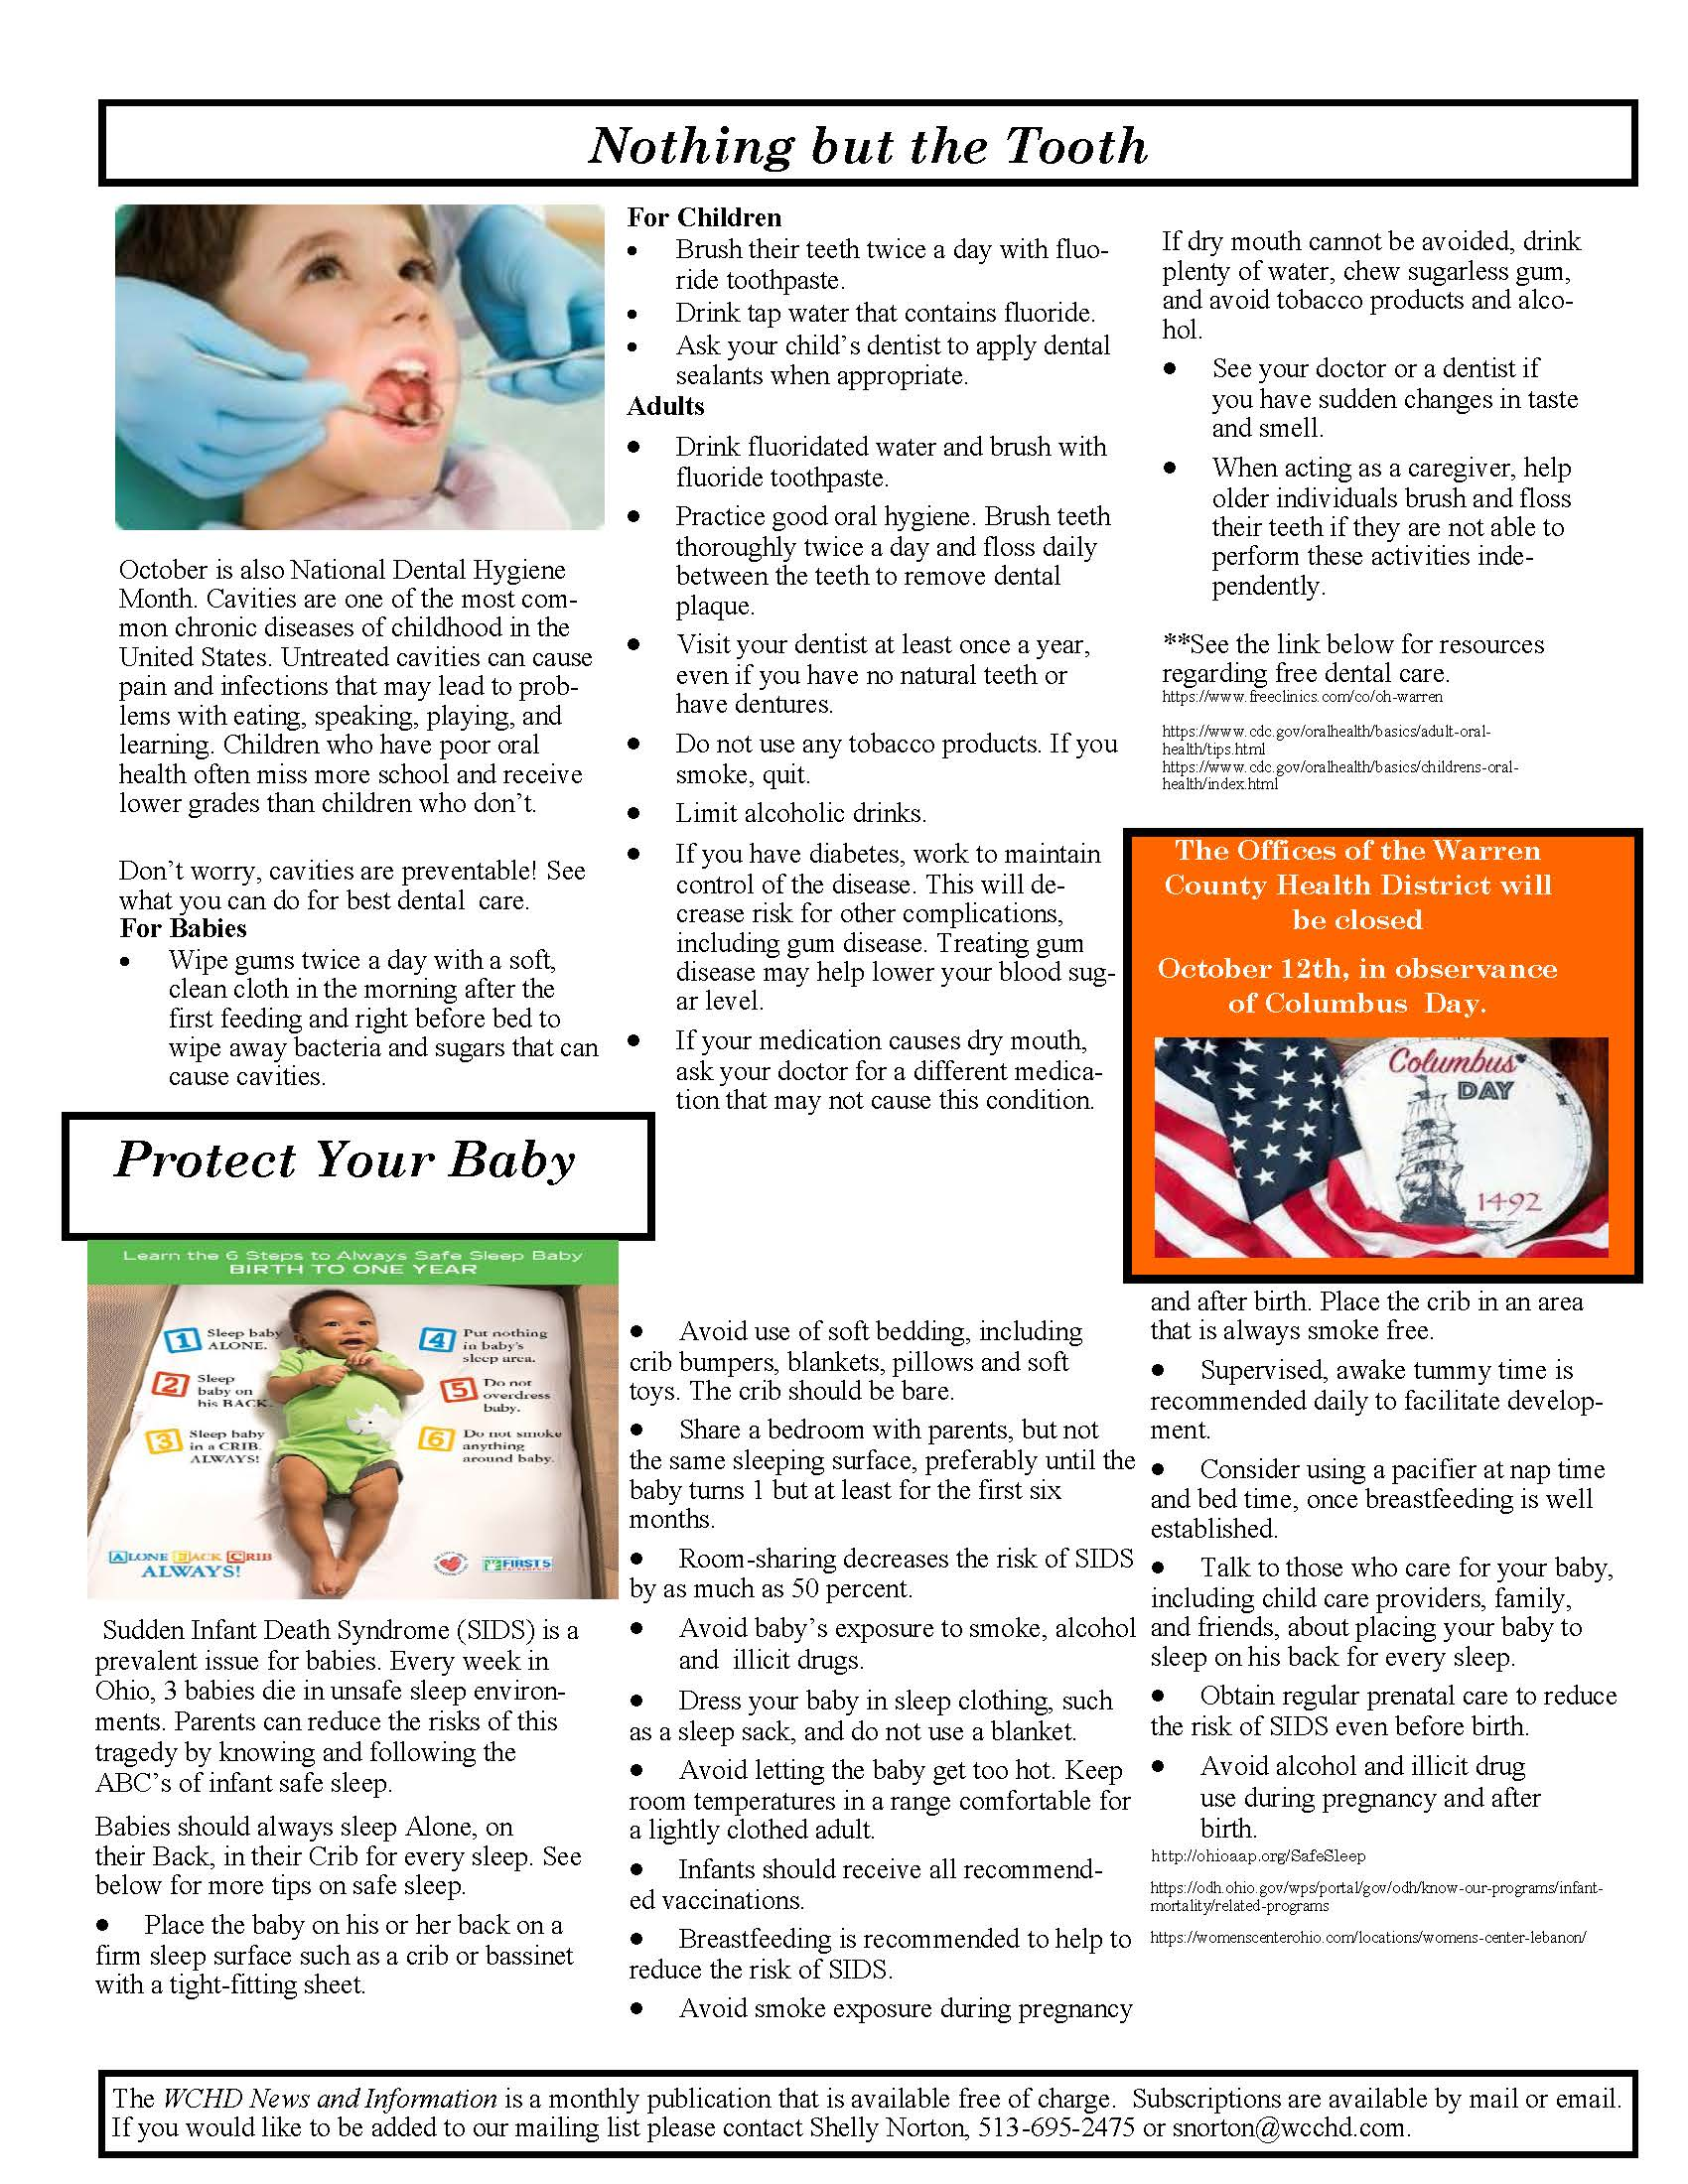 Warren County Health District Newsletter Page 2